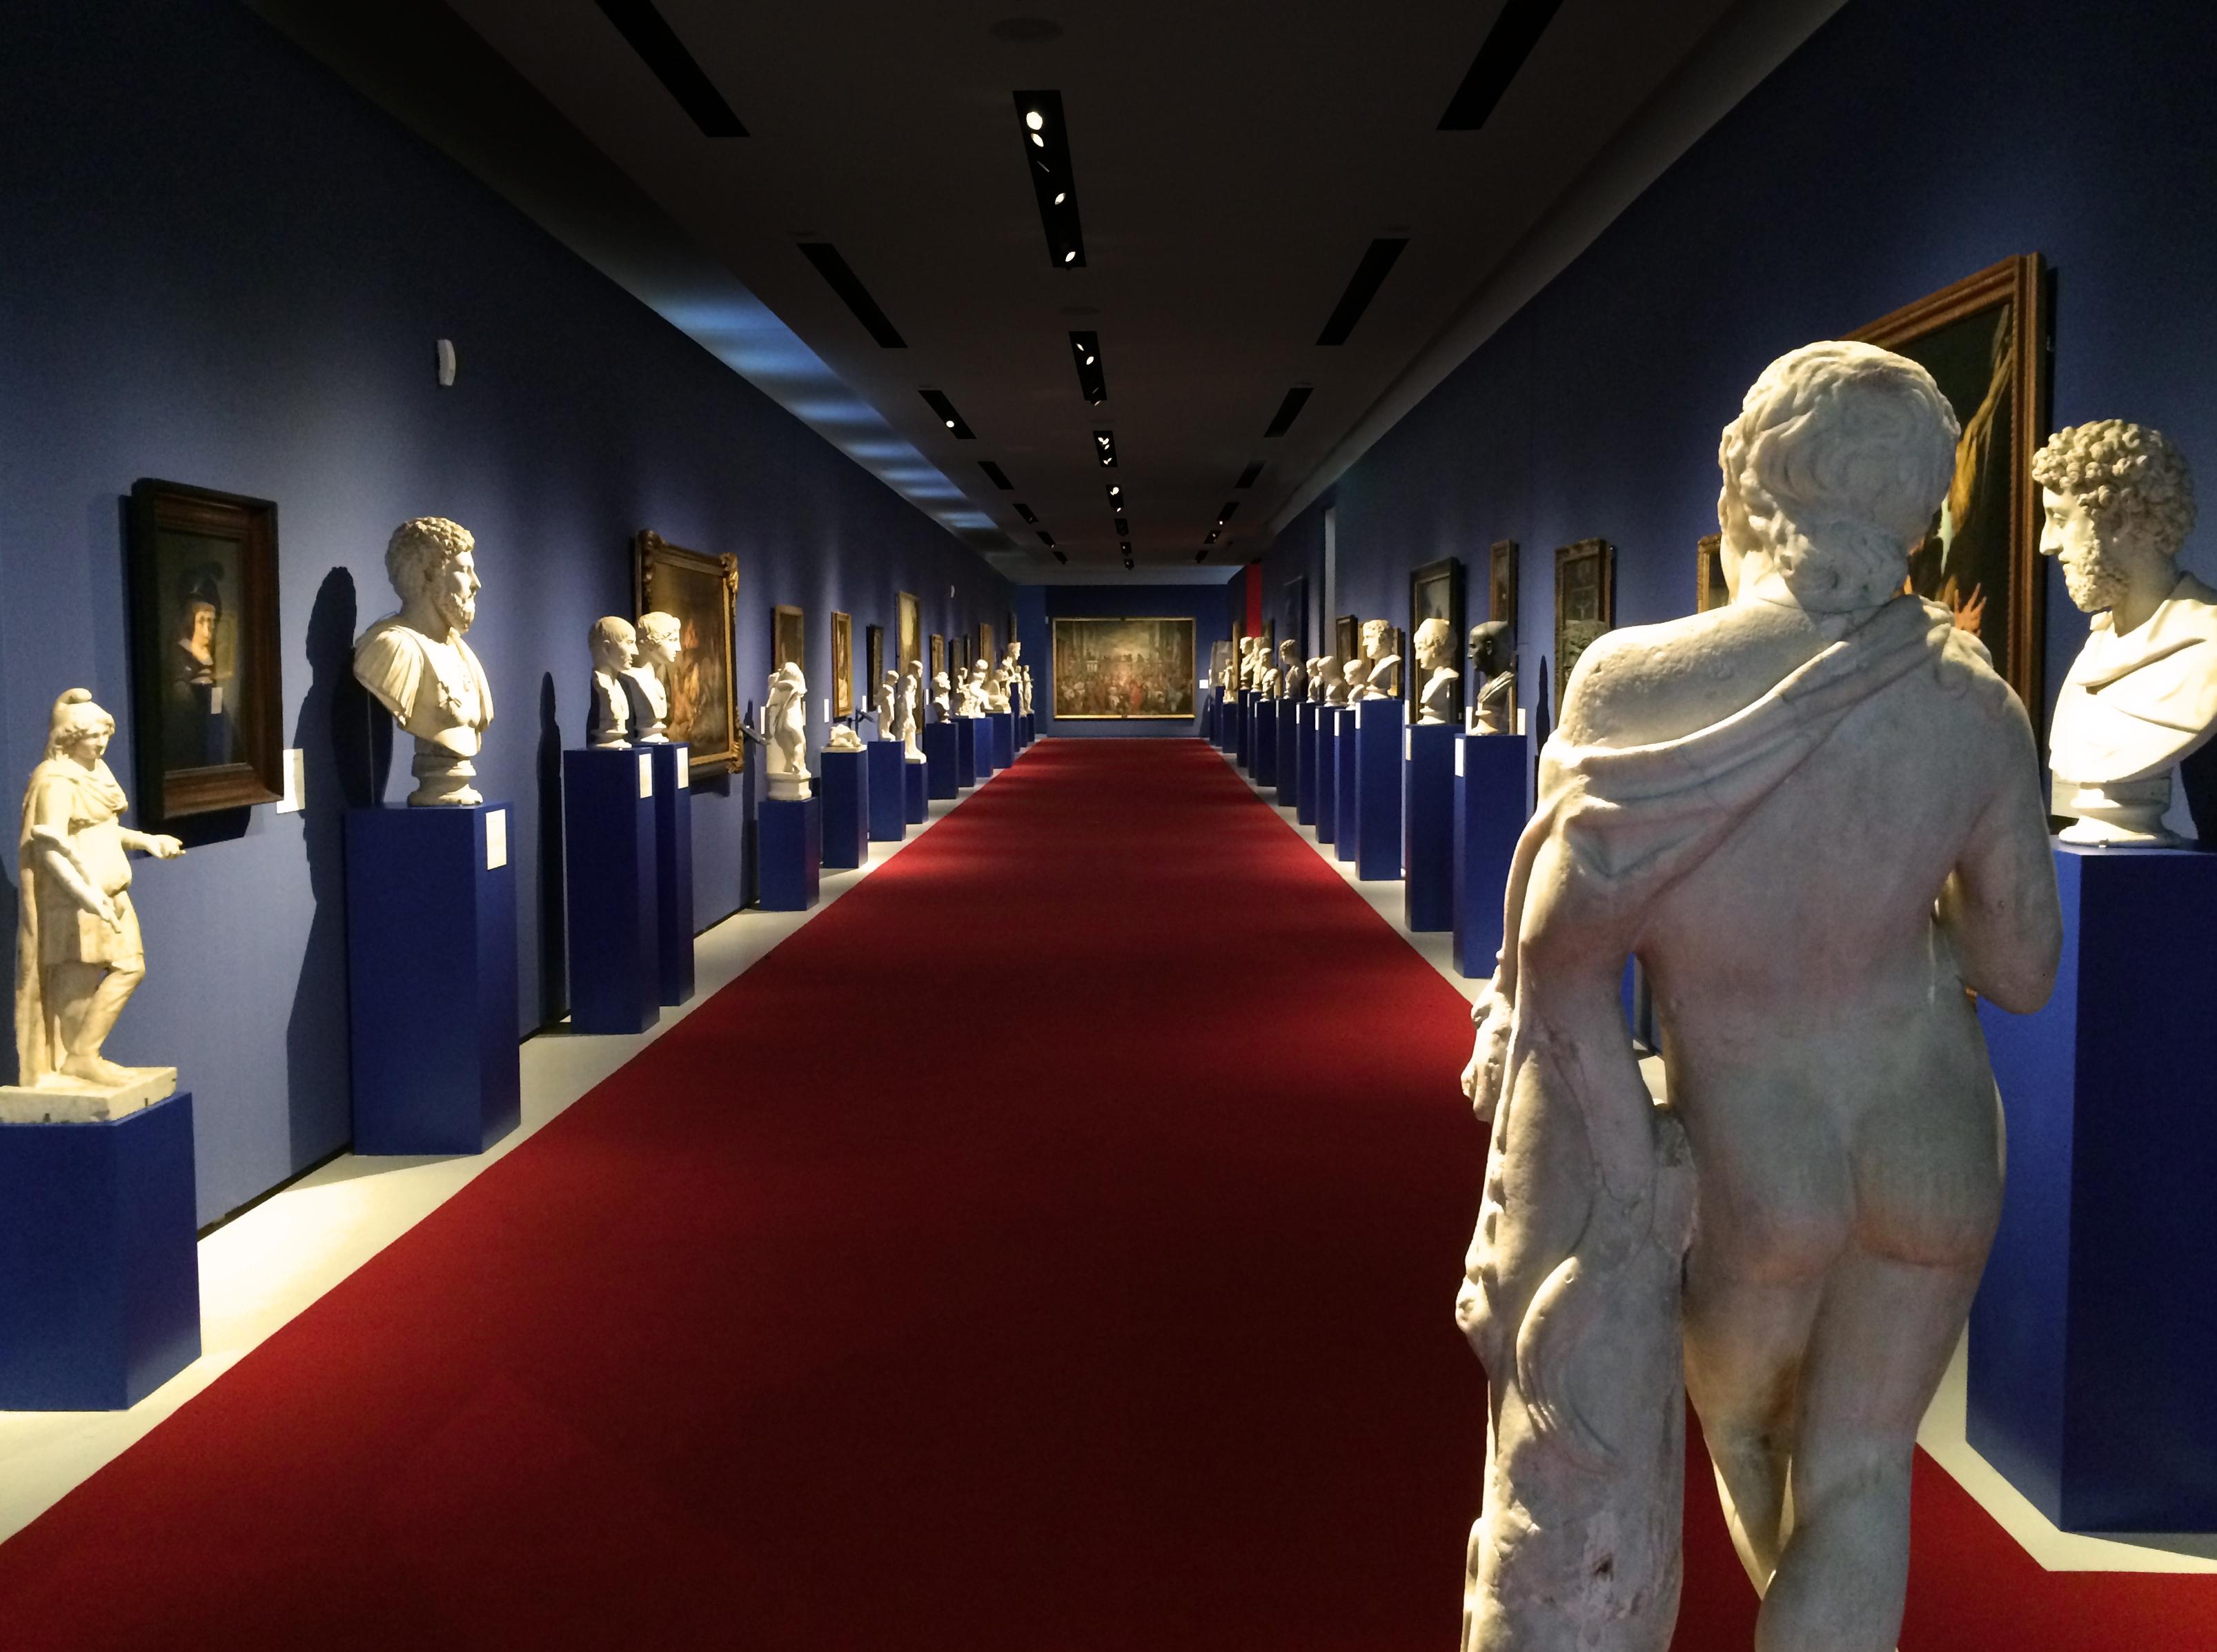 Fig. 4 View along the corridor of the Wallmoden exhibition.